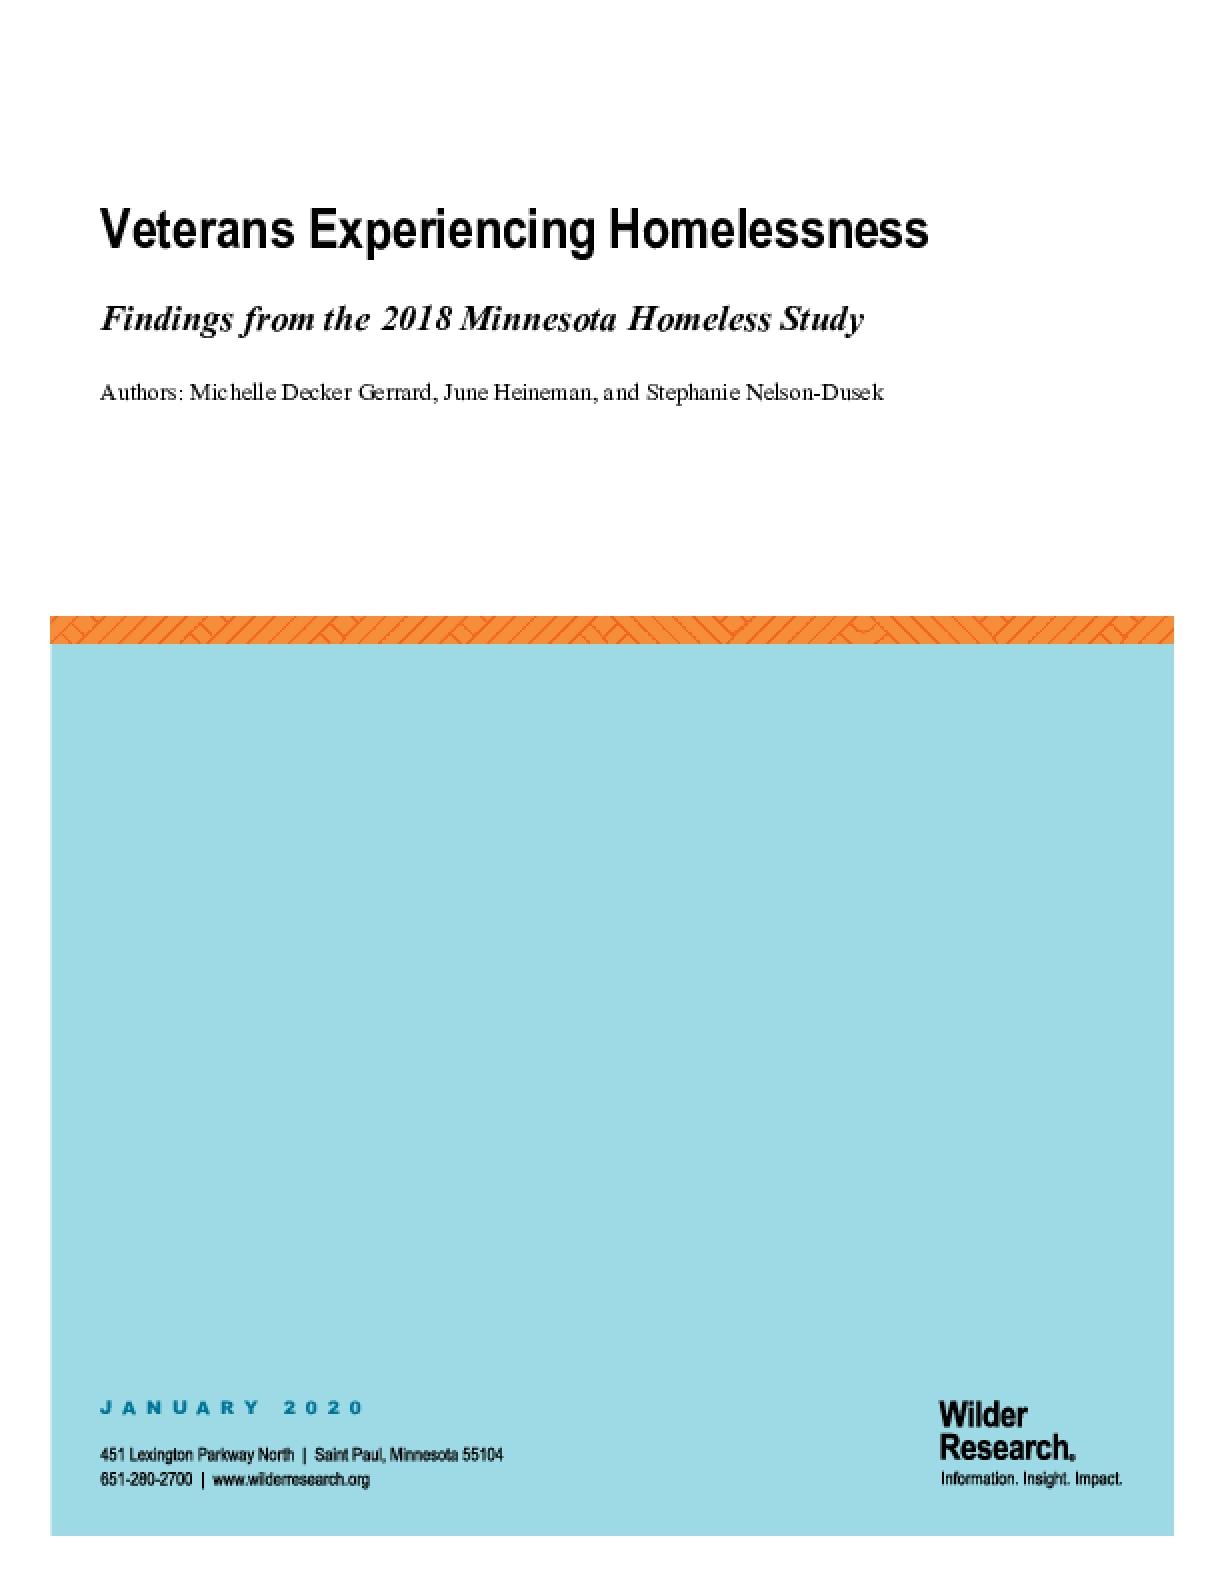 Veterans Experiencing Homelessness: Findings rom the 2018 Minnesota Homeless Study